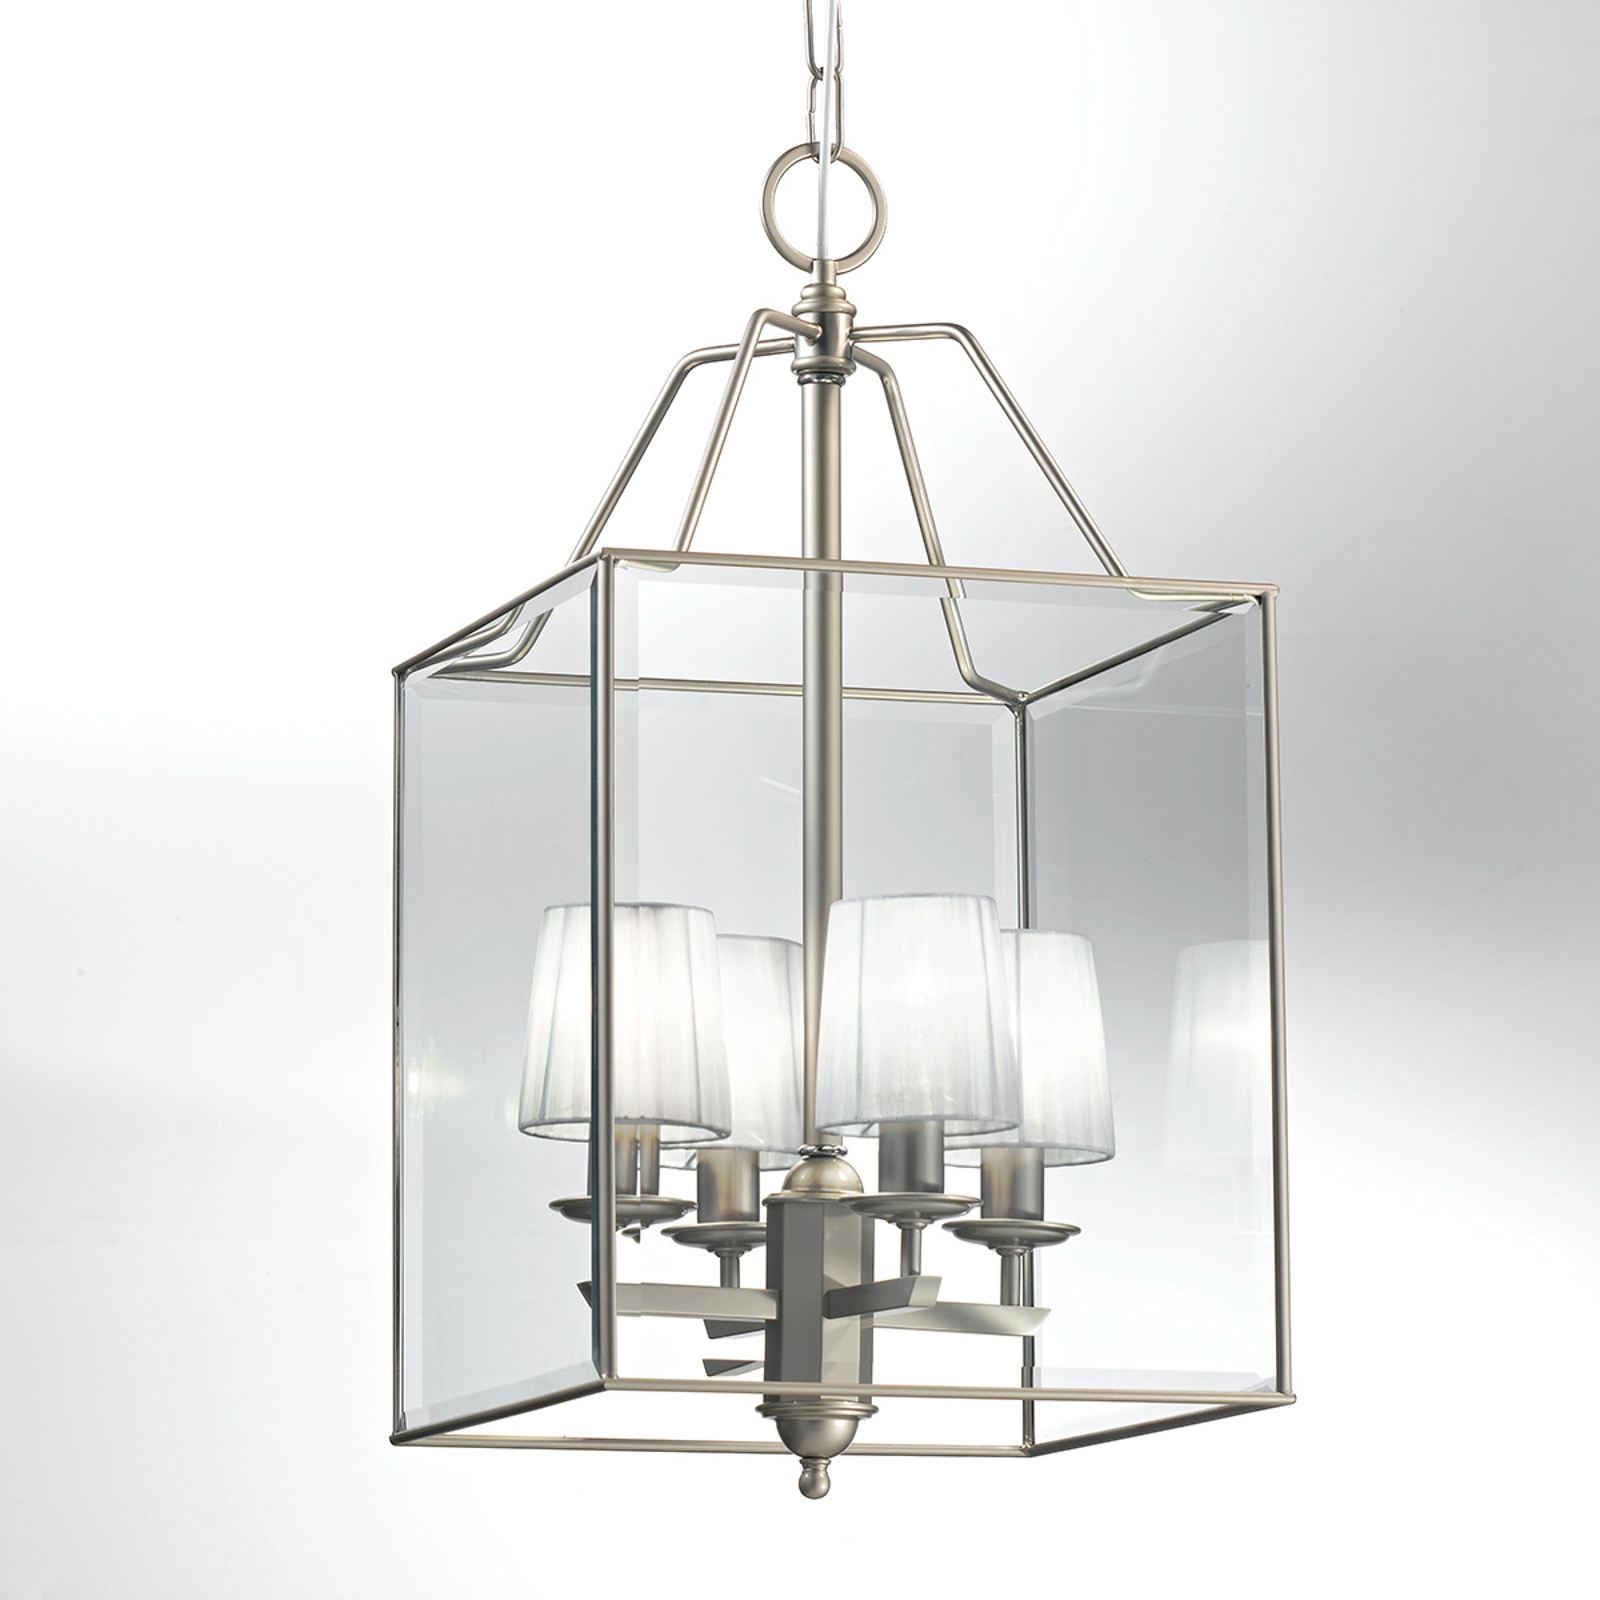 Fascinerande taklampa Lampione nickel